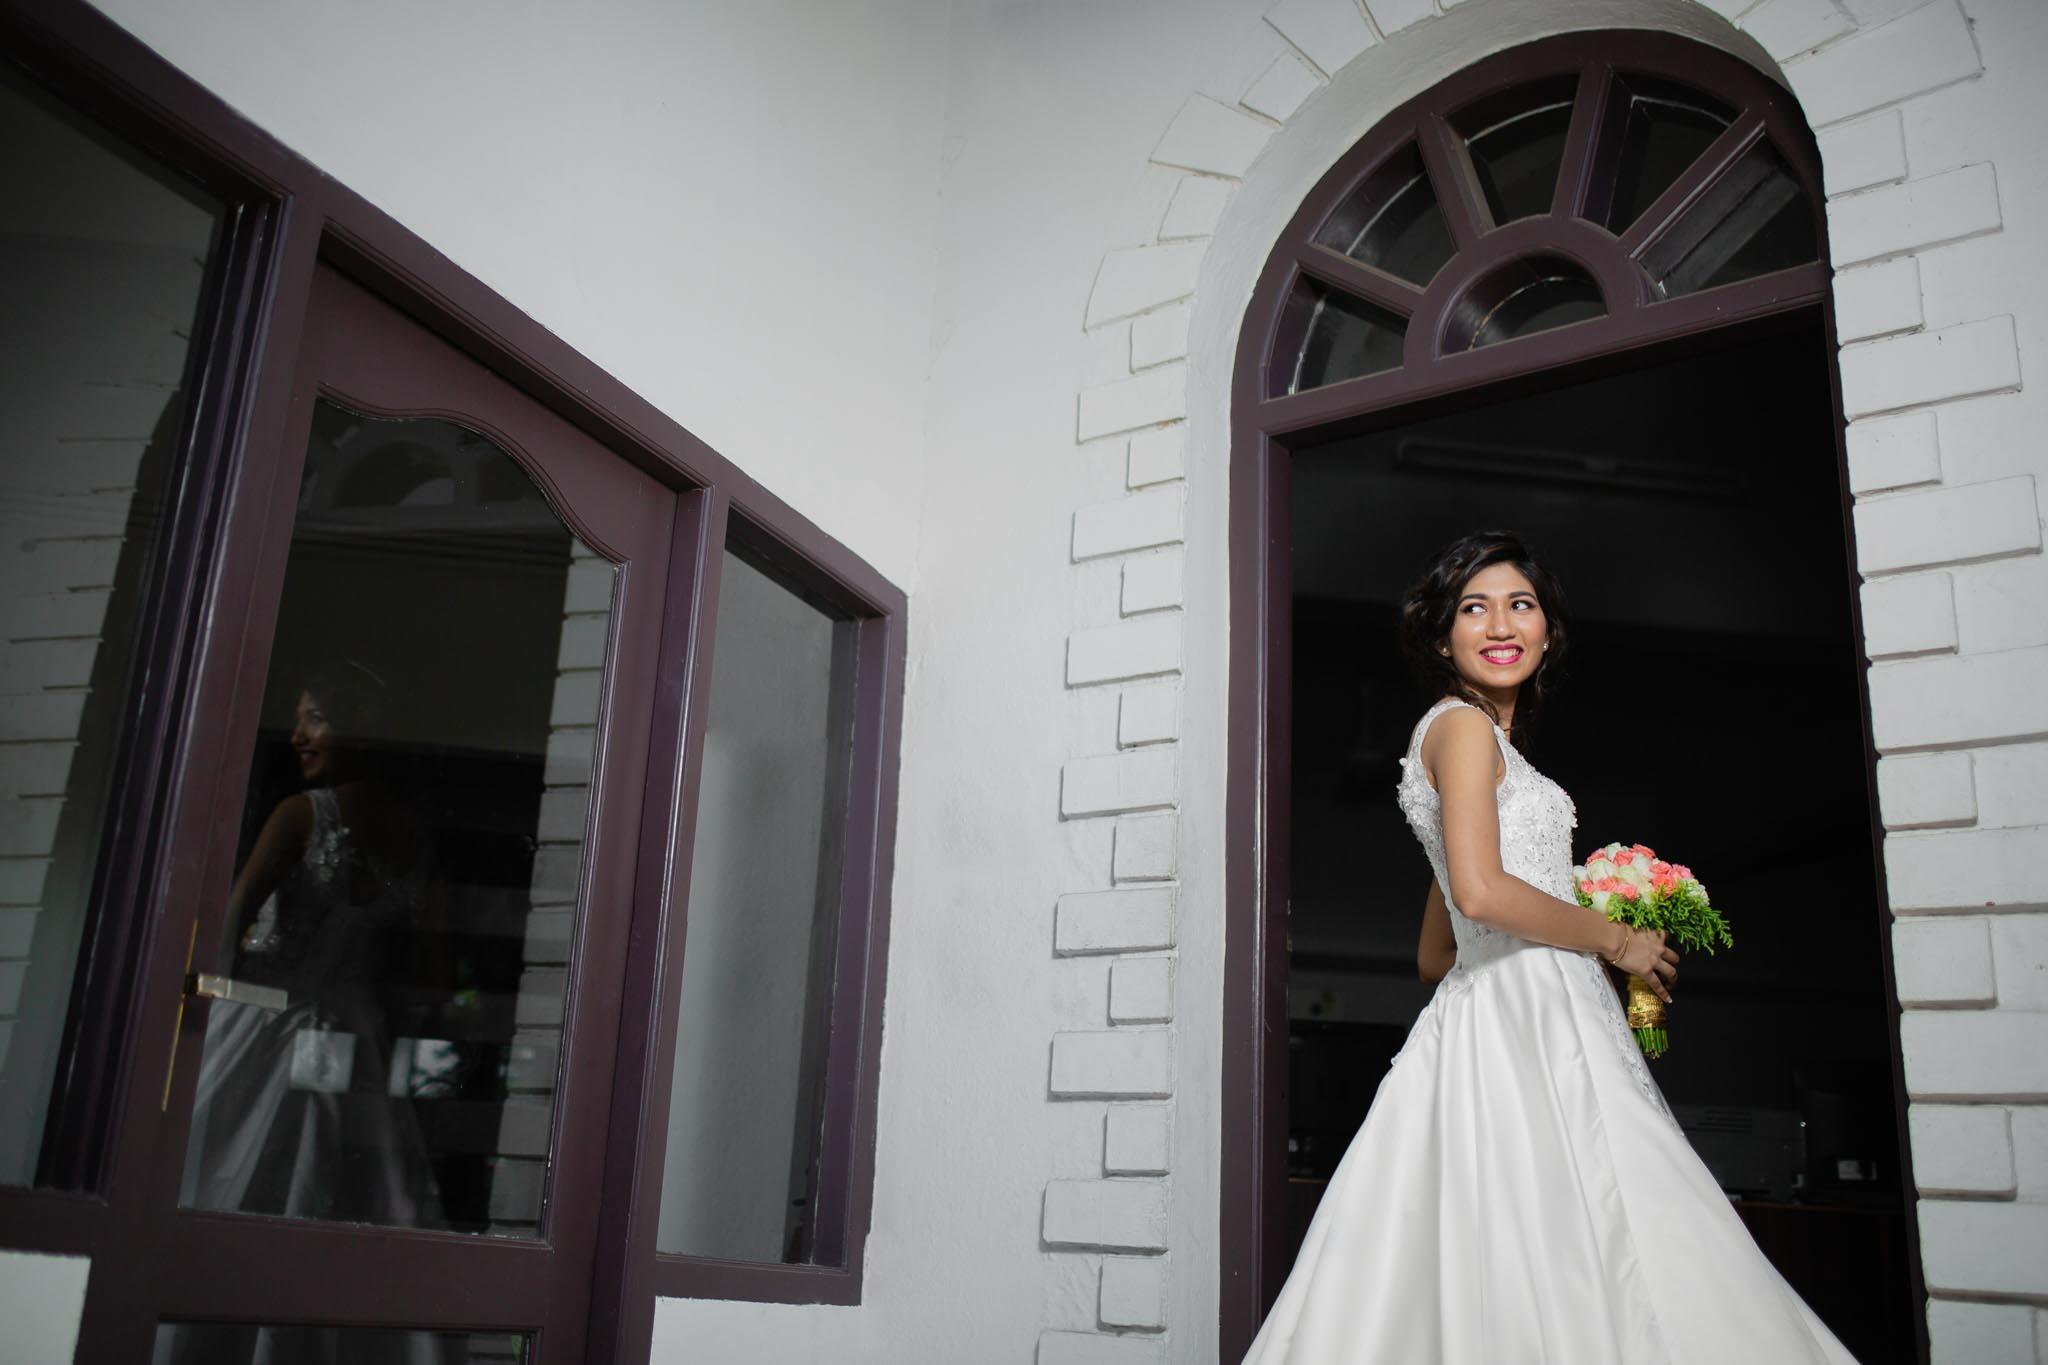 Best-of-2018-wedding-photography-focuz-studios-34